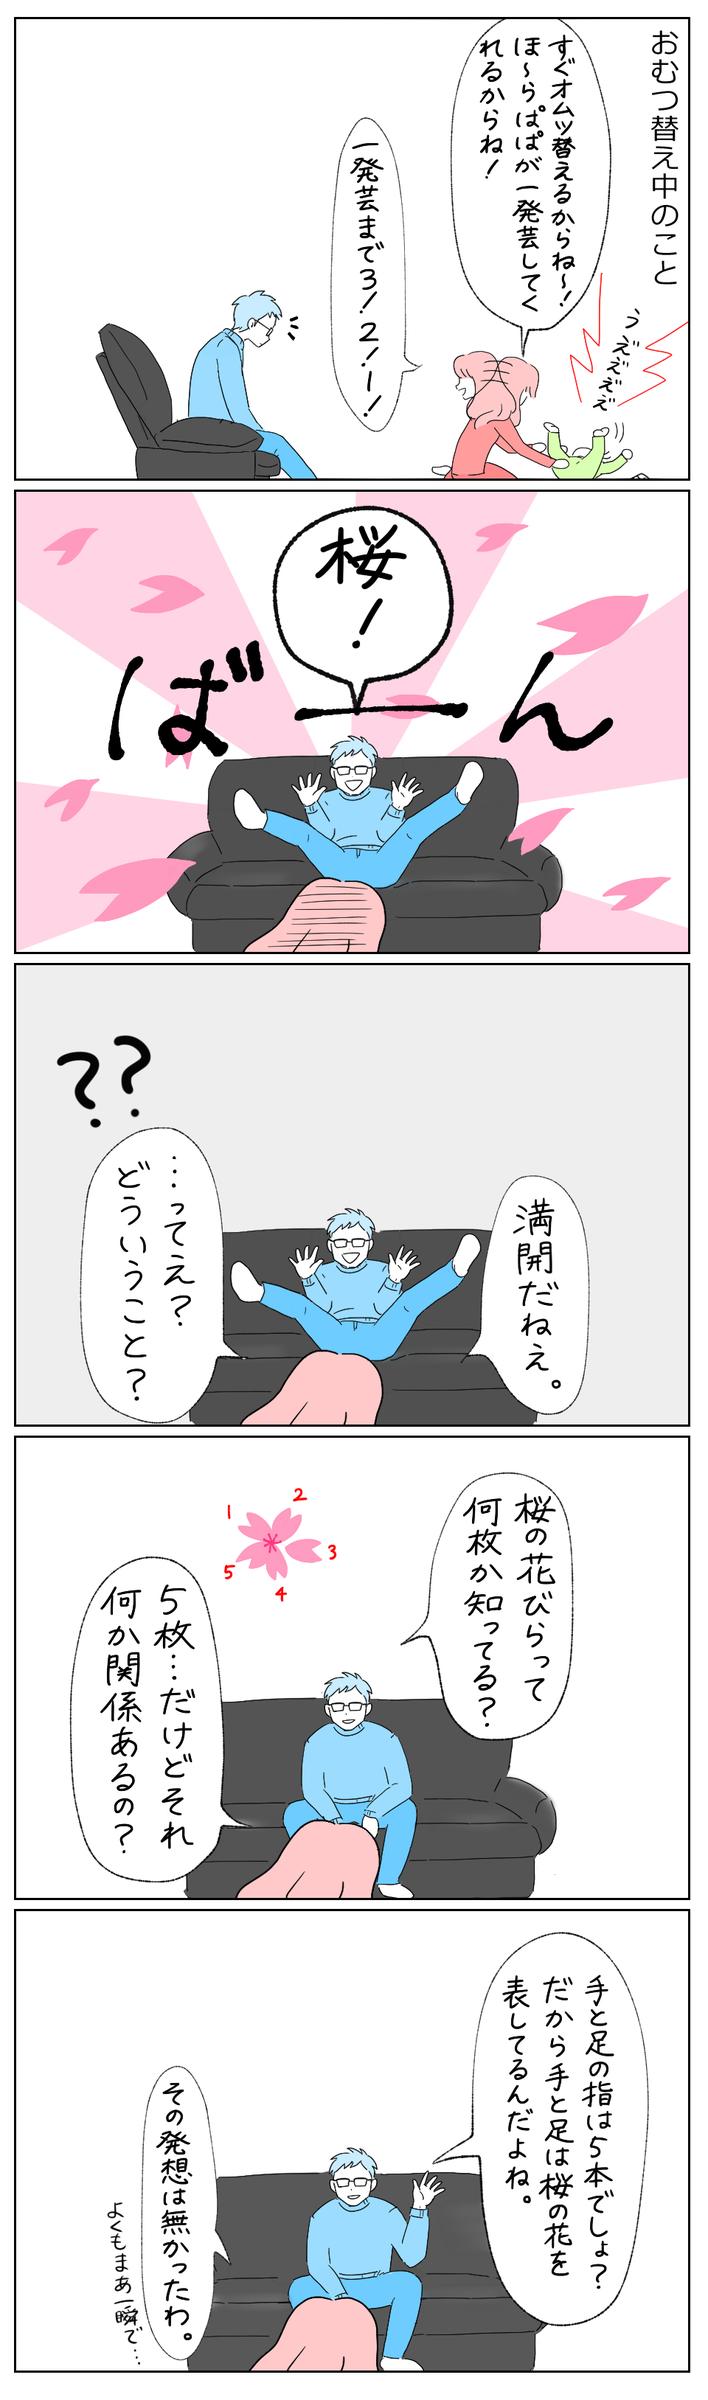 f:id:kayarimo:20190319200431j:plain